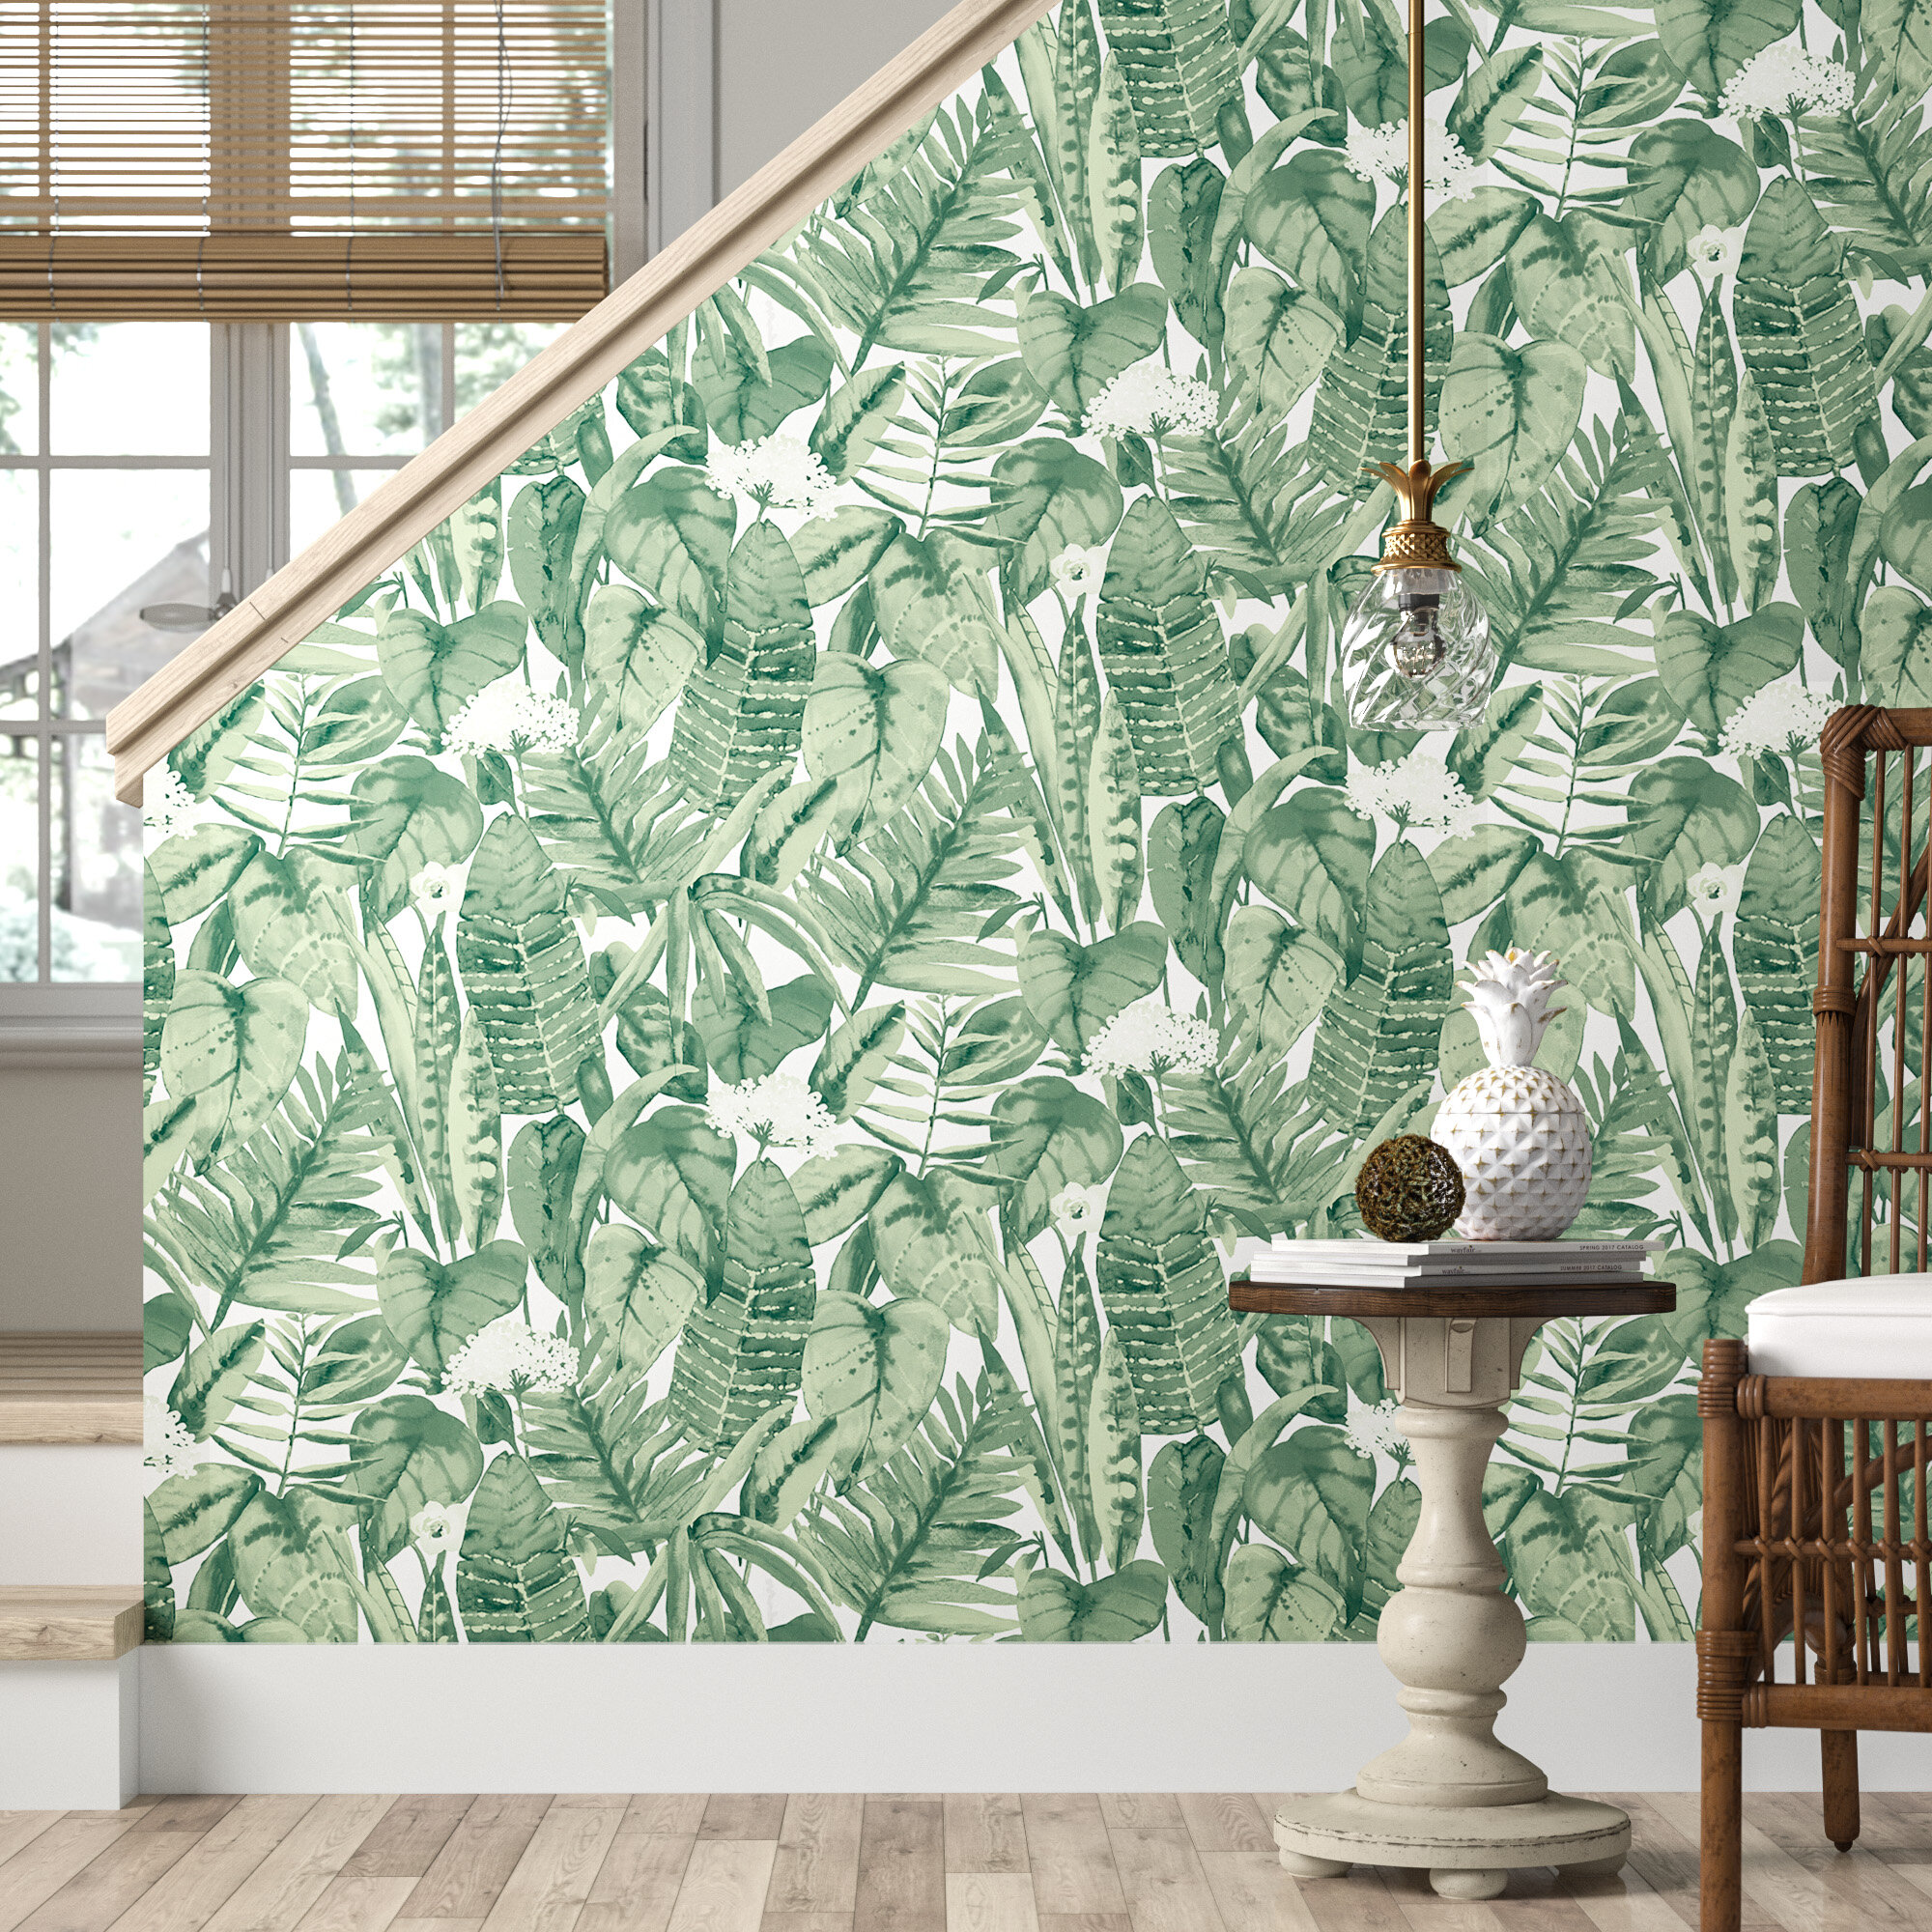 Bay Isle Home Waloo Tropical Jungle 16 5 L X 20 5 W Smooth Peel And Stick Wallpaper Roll Reviews Wayfair